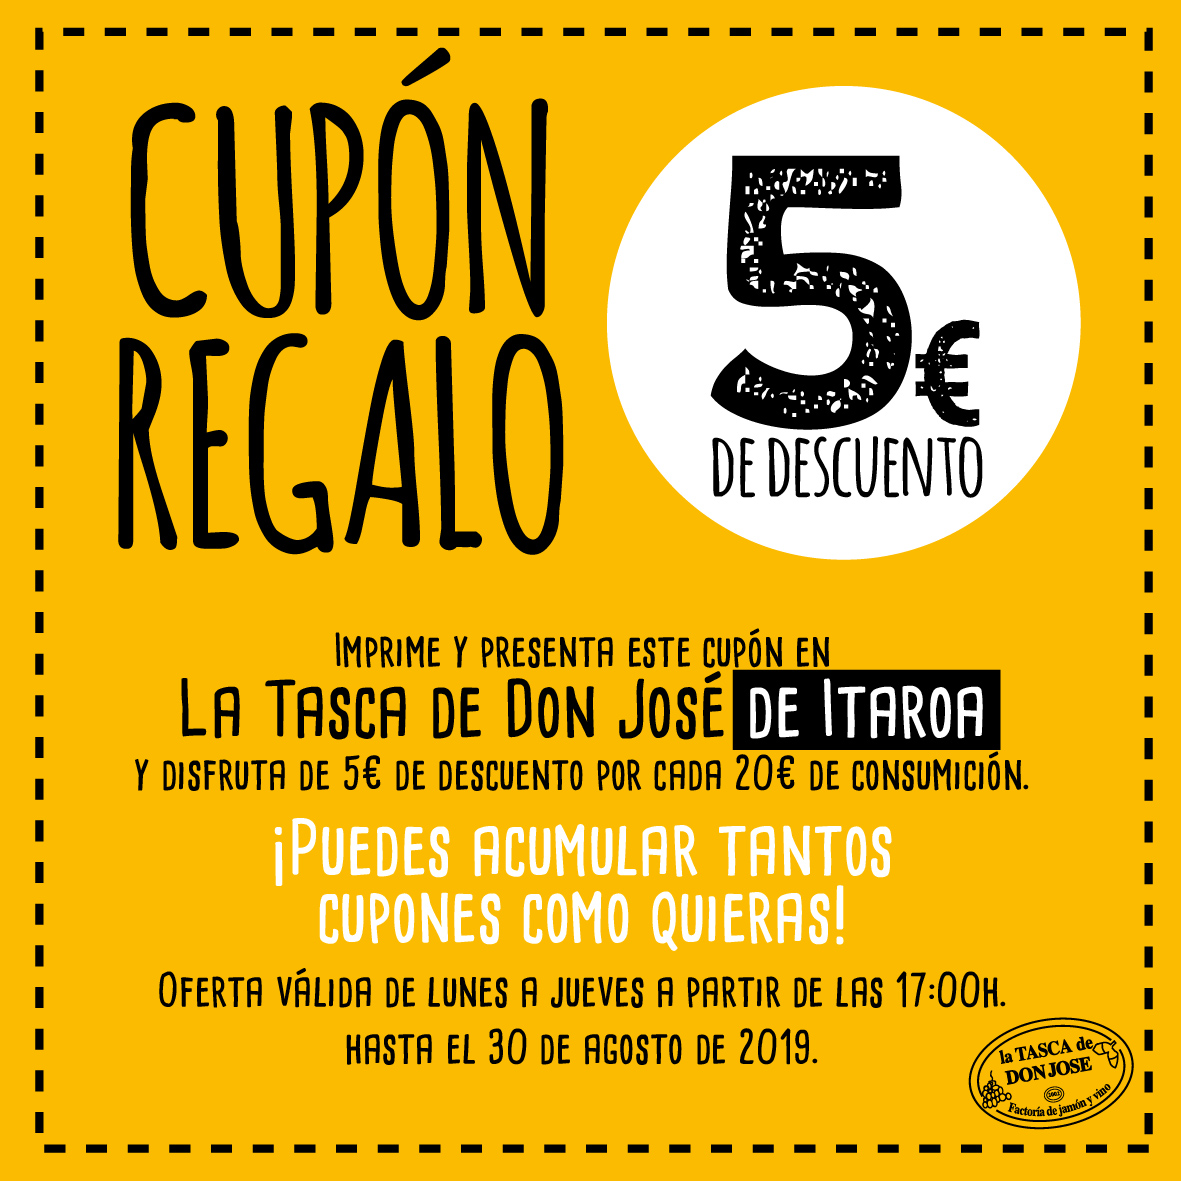 Cupon-5euros-04